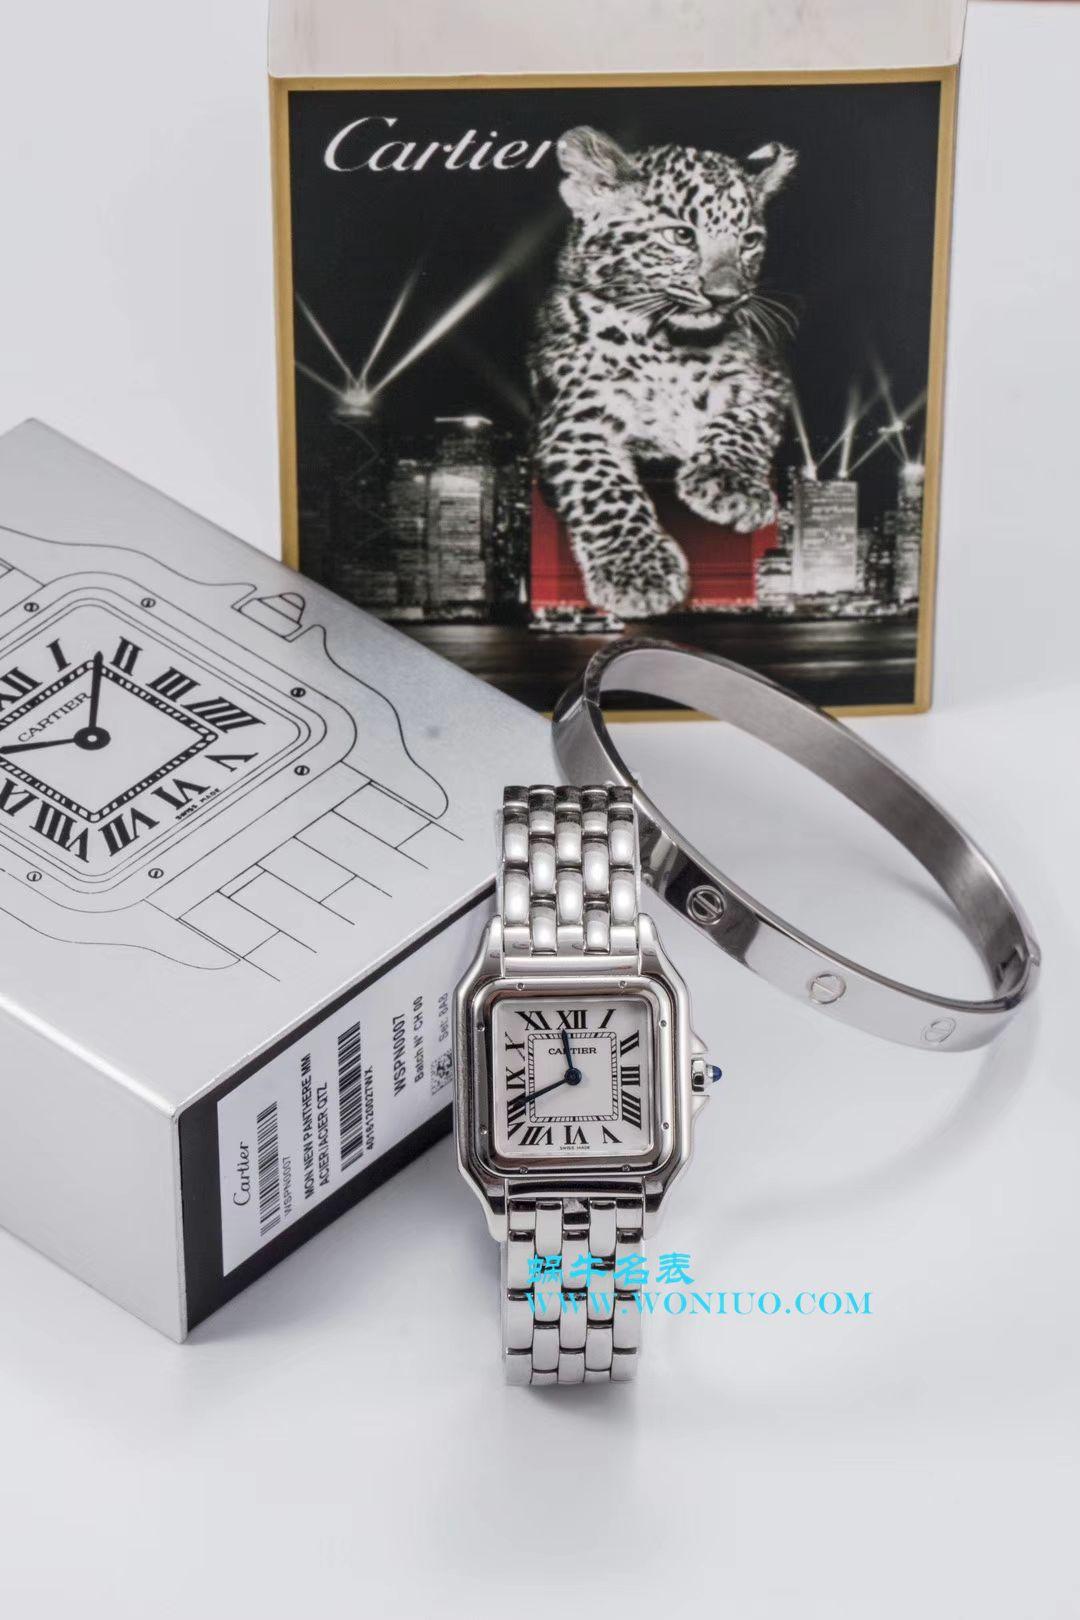 DJ Factory 卡地亚猎豹系列腕表--型号WSPN0007 PANTHÈRE DE CARTIER系列卡地亚猎豹腕表 / K159